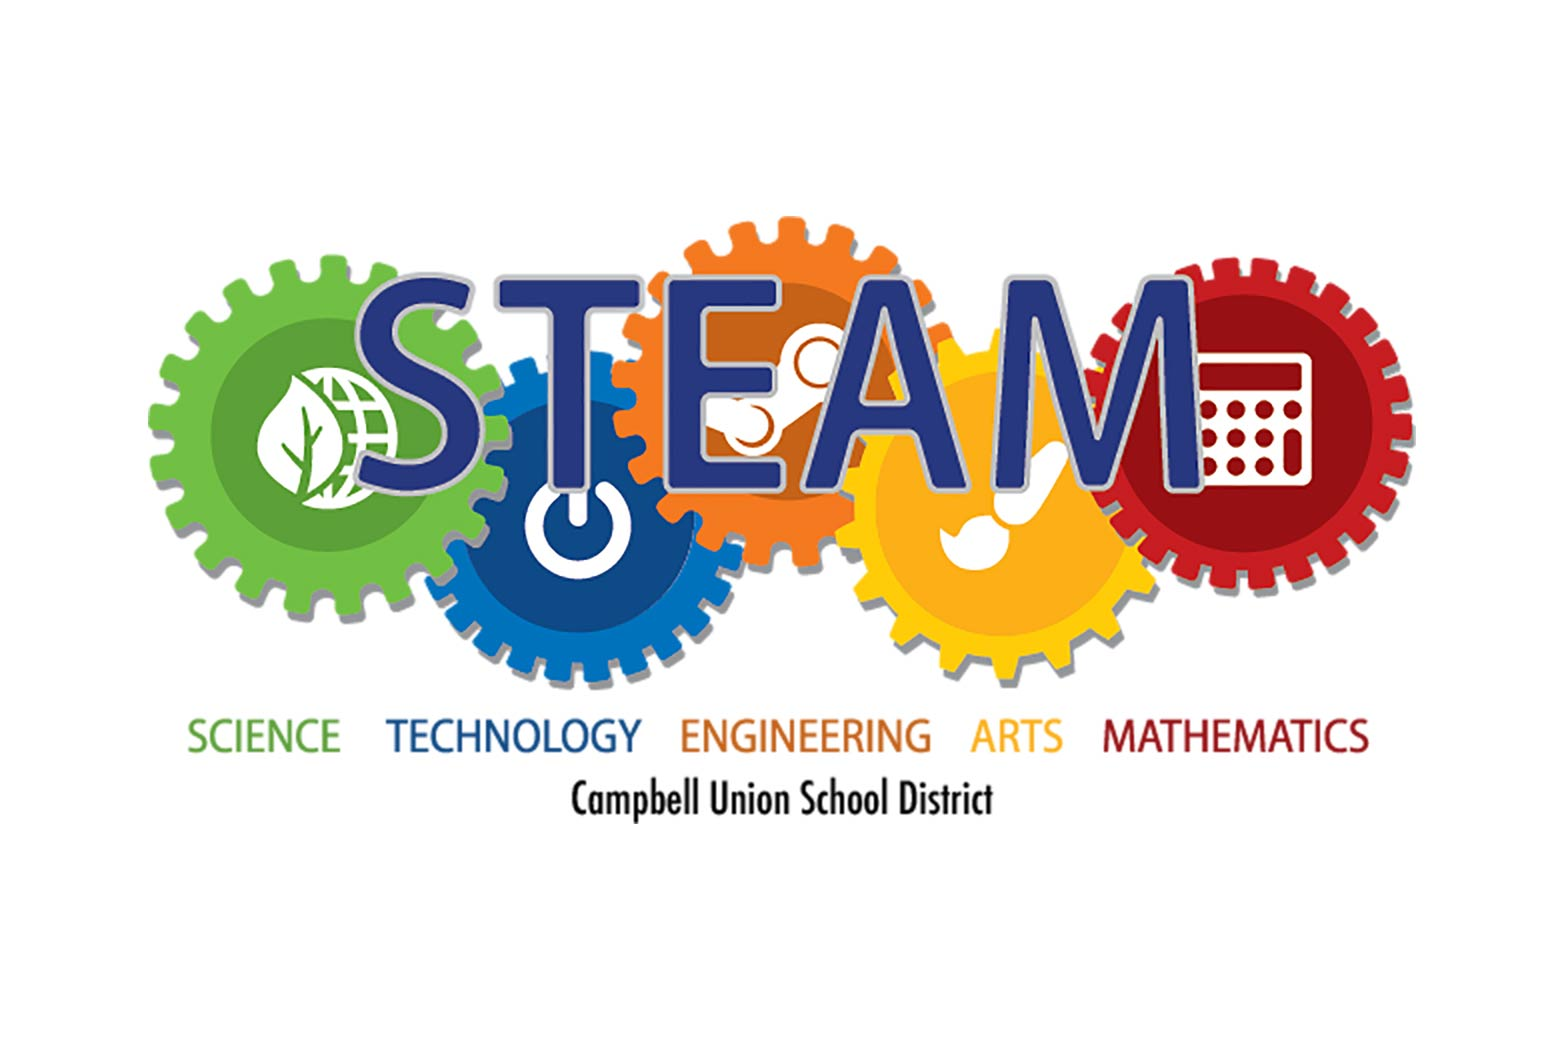 Campbell Union School District STEAM Showcase